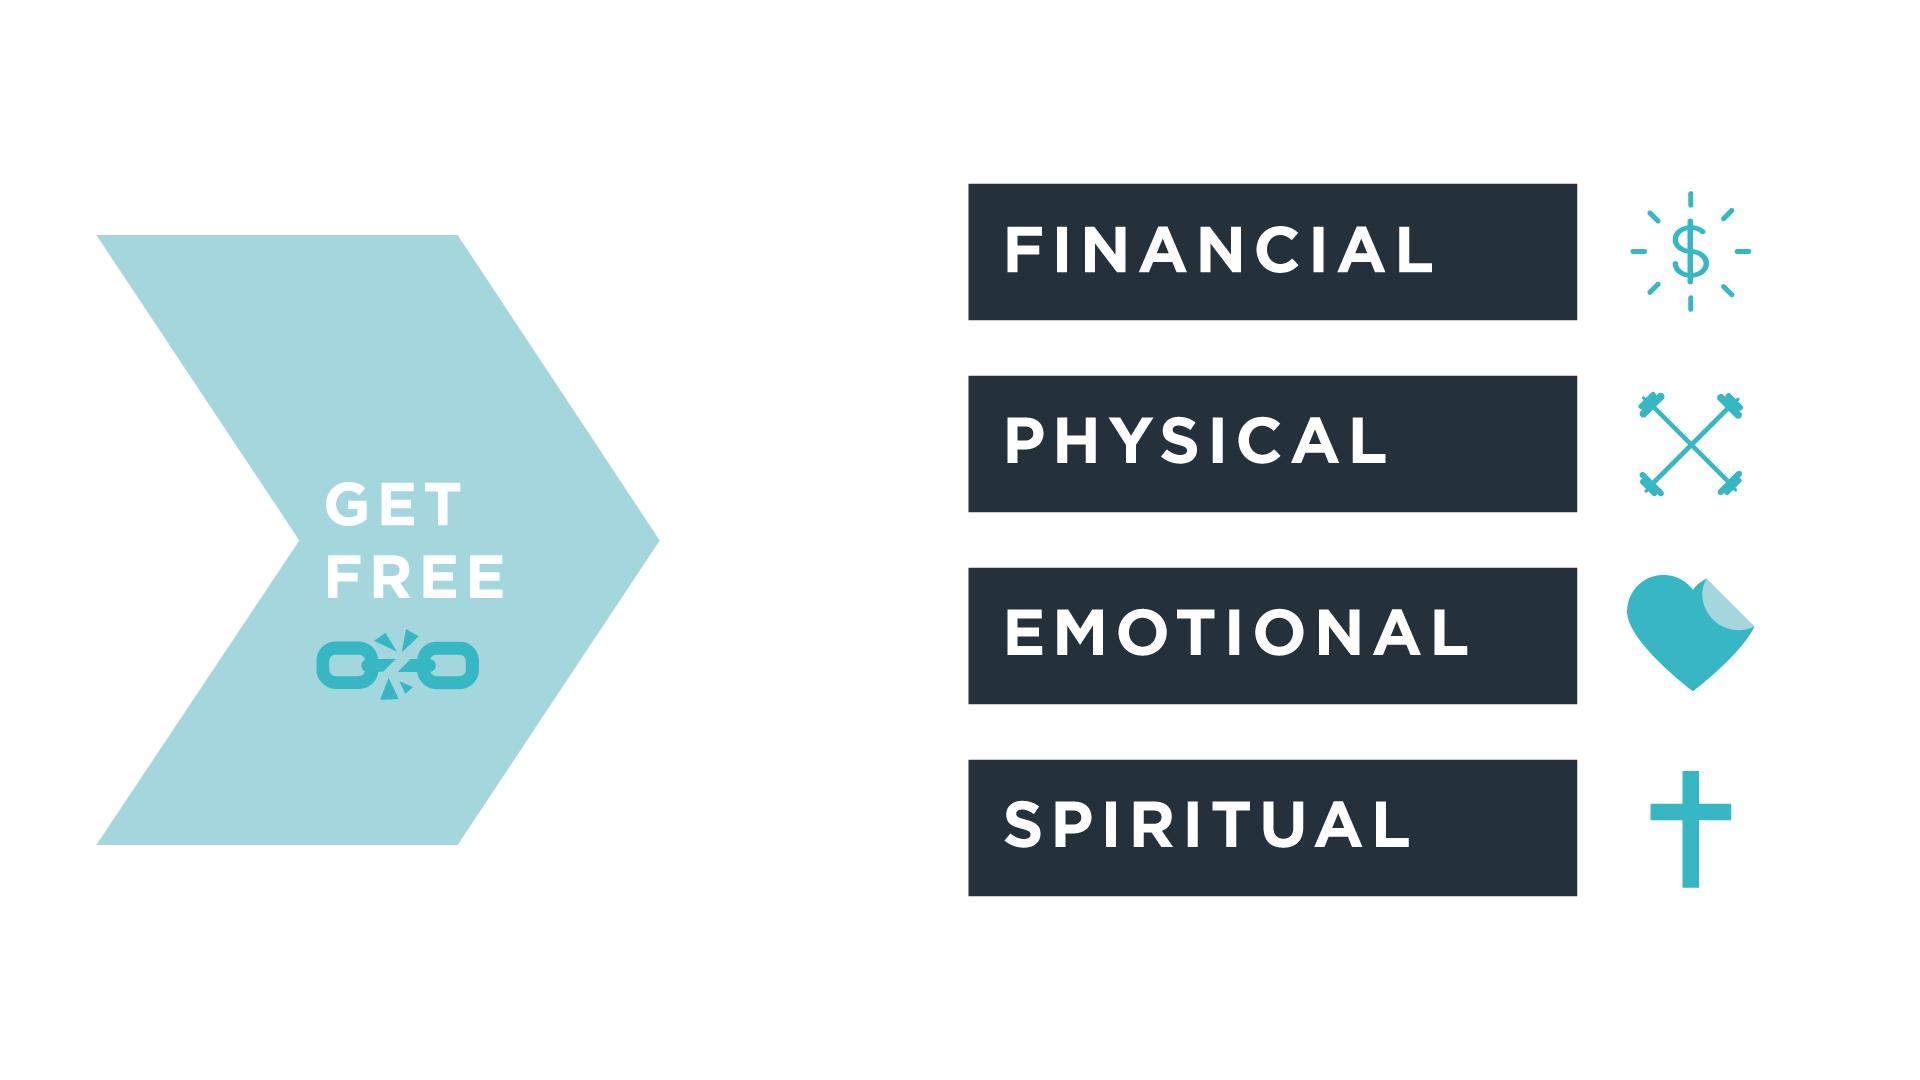 belonging-get-free-stage-5-final.png